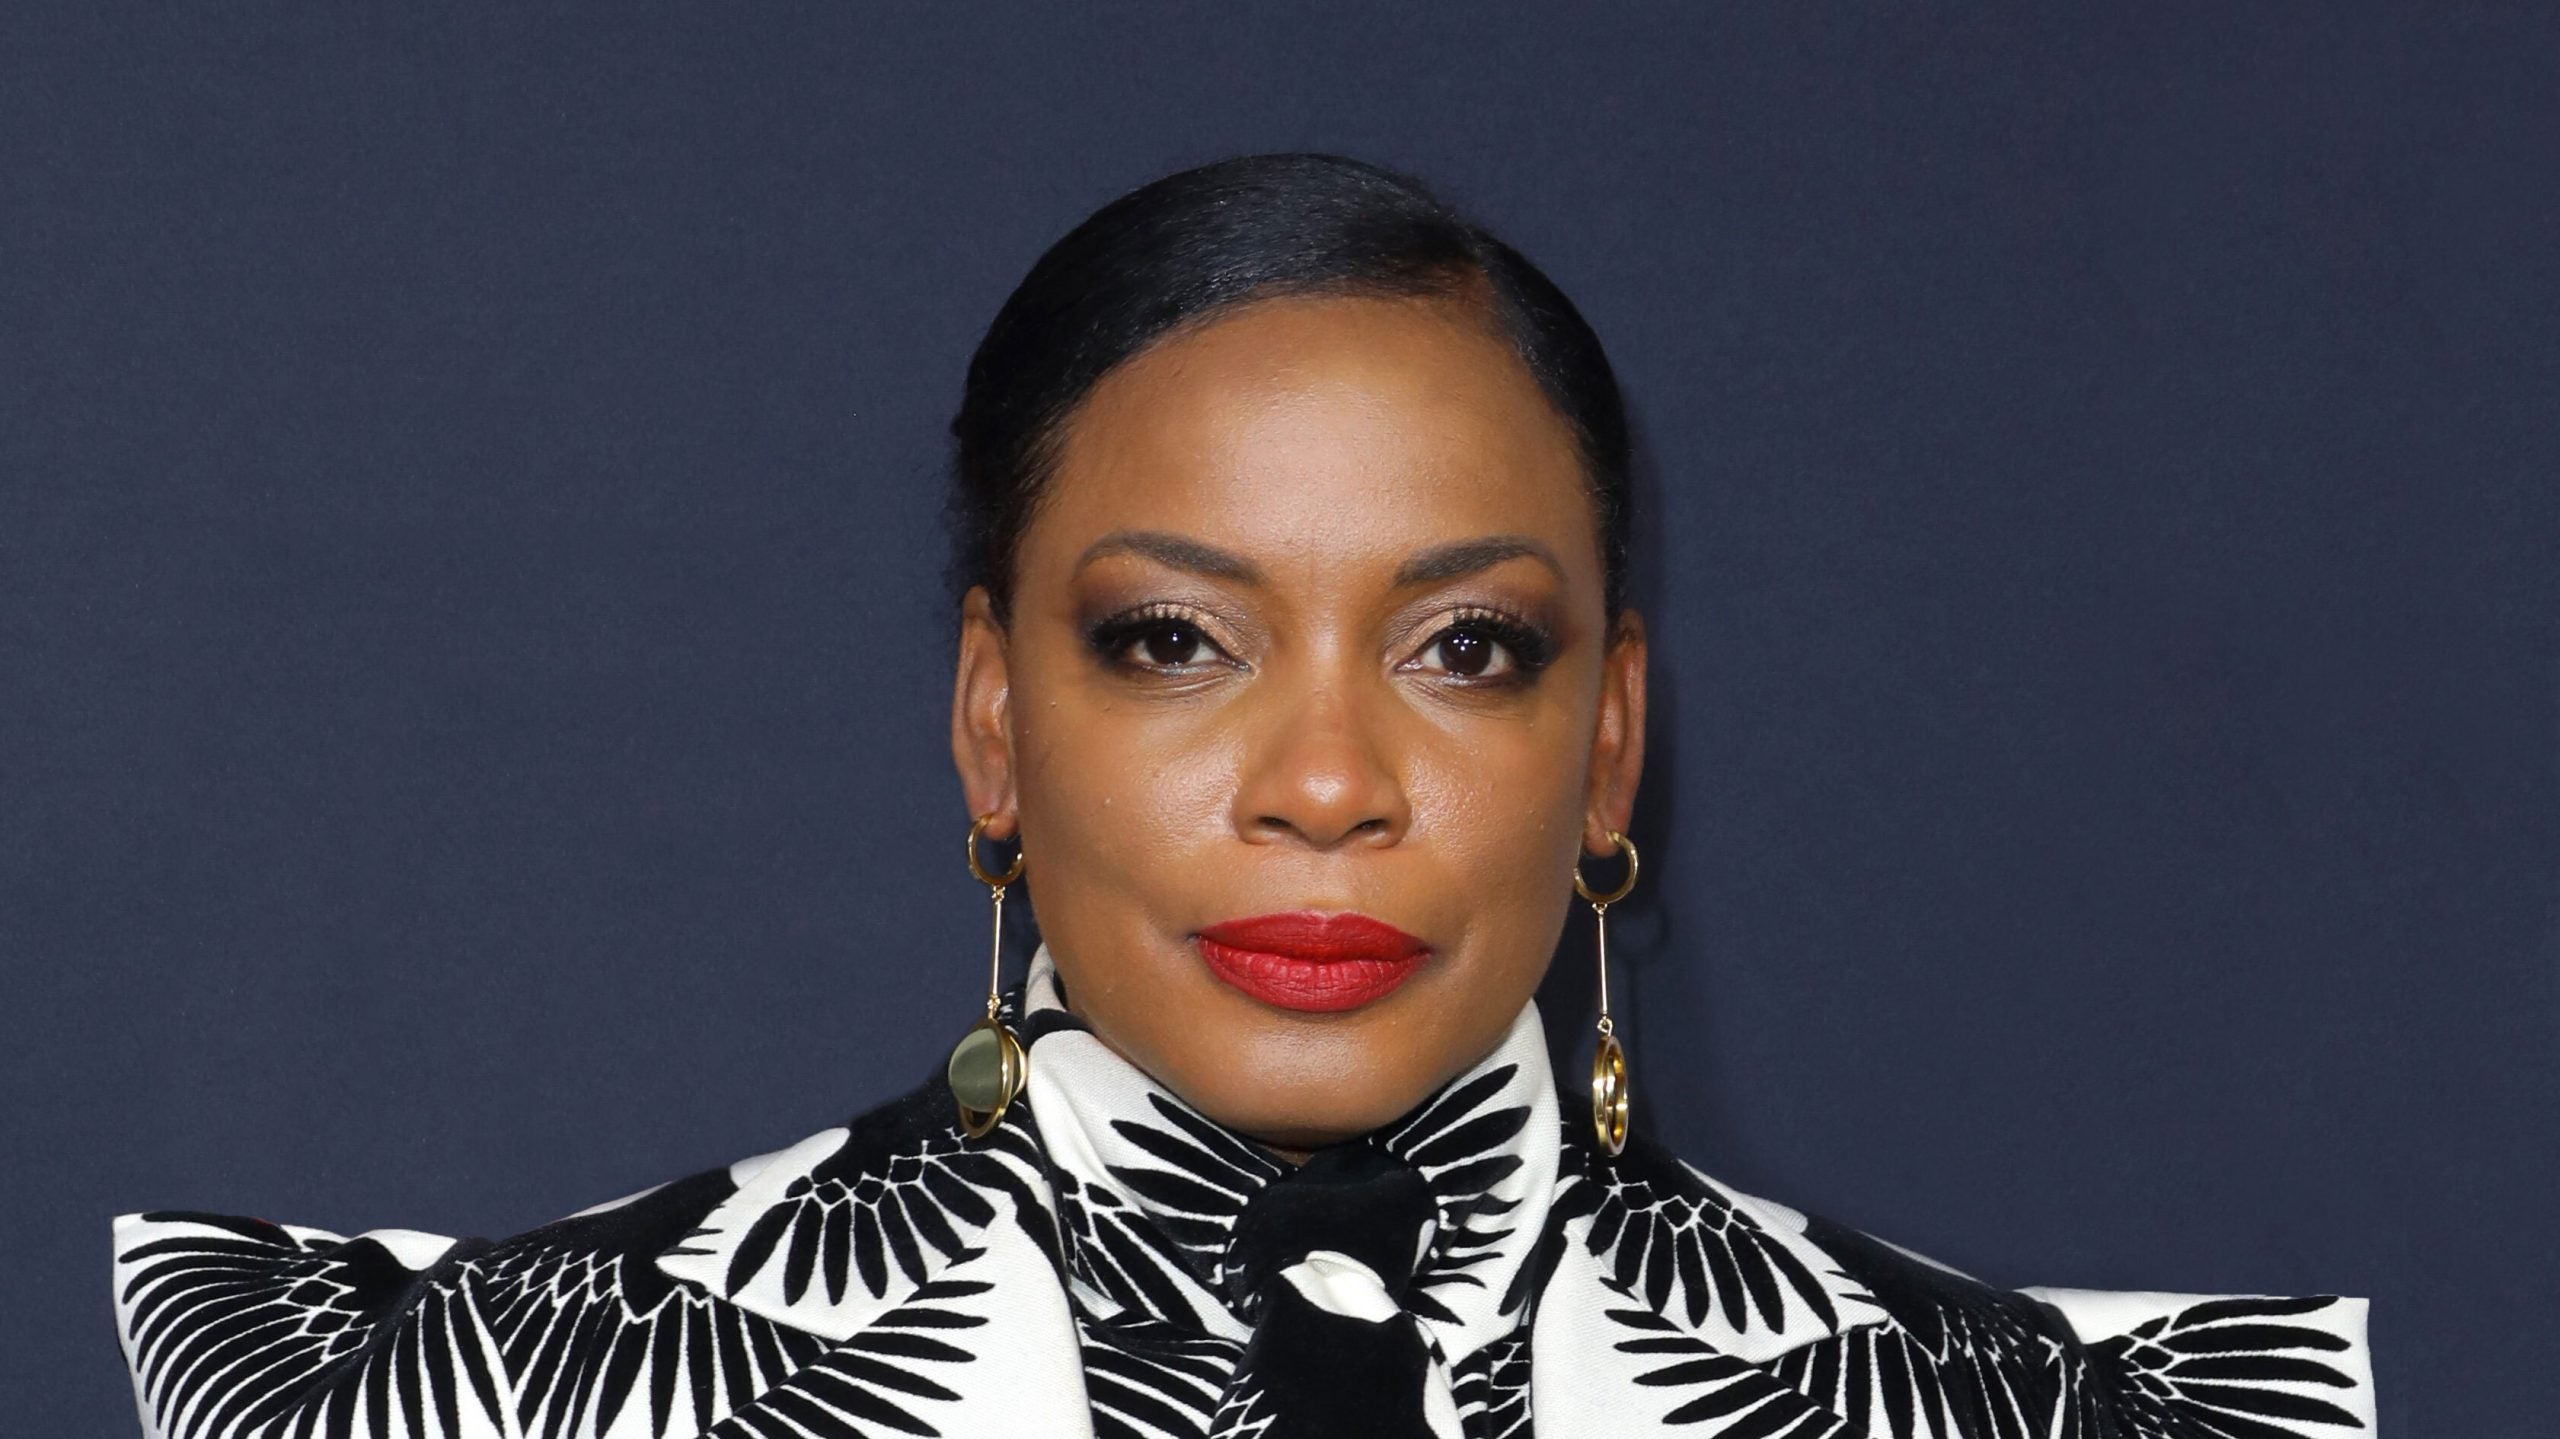 EXCLUSIVE: Aunjanue Ellis Breaks Her Silence On Emmy Snub